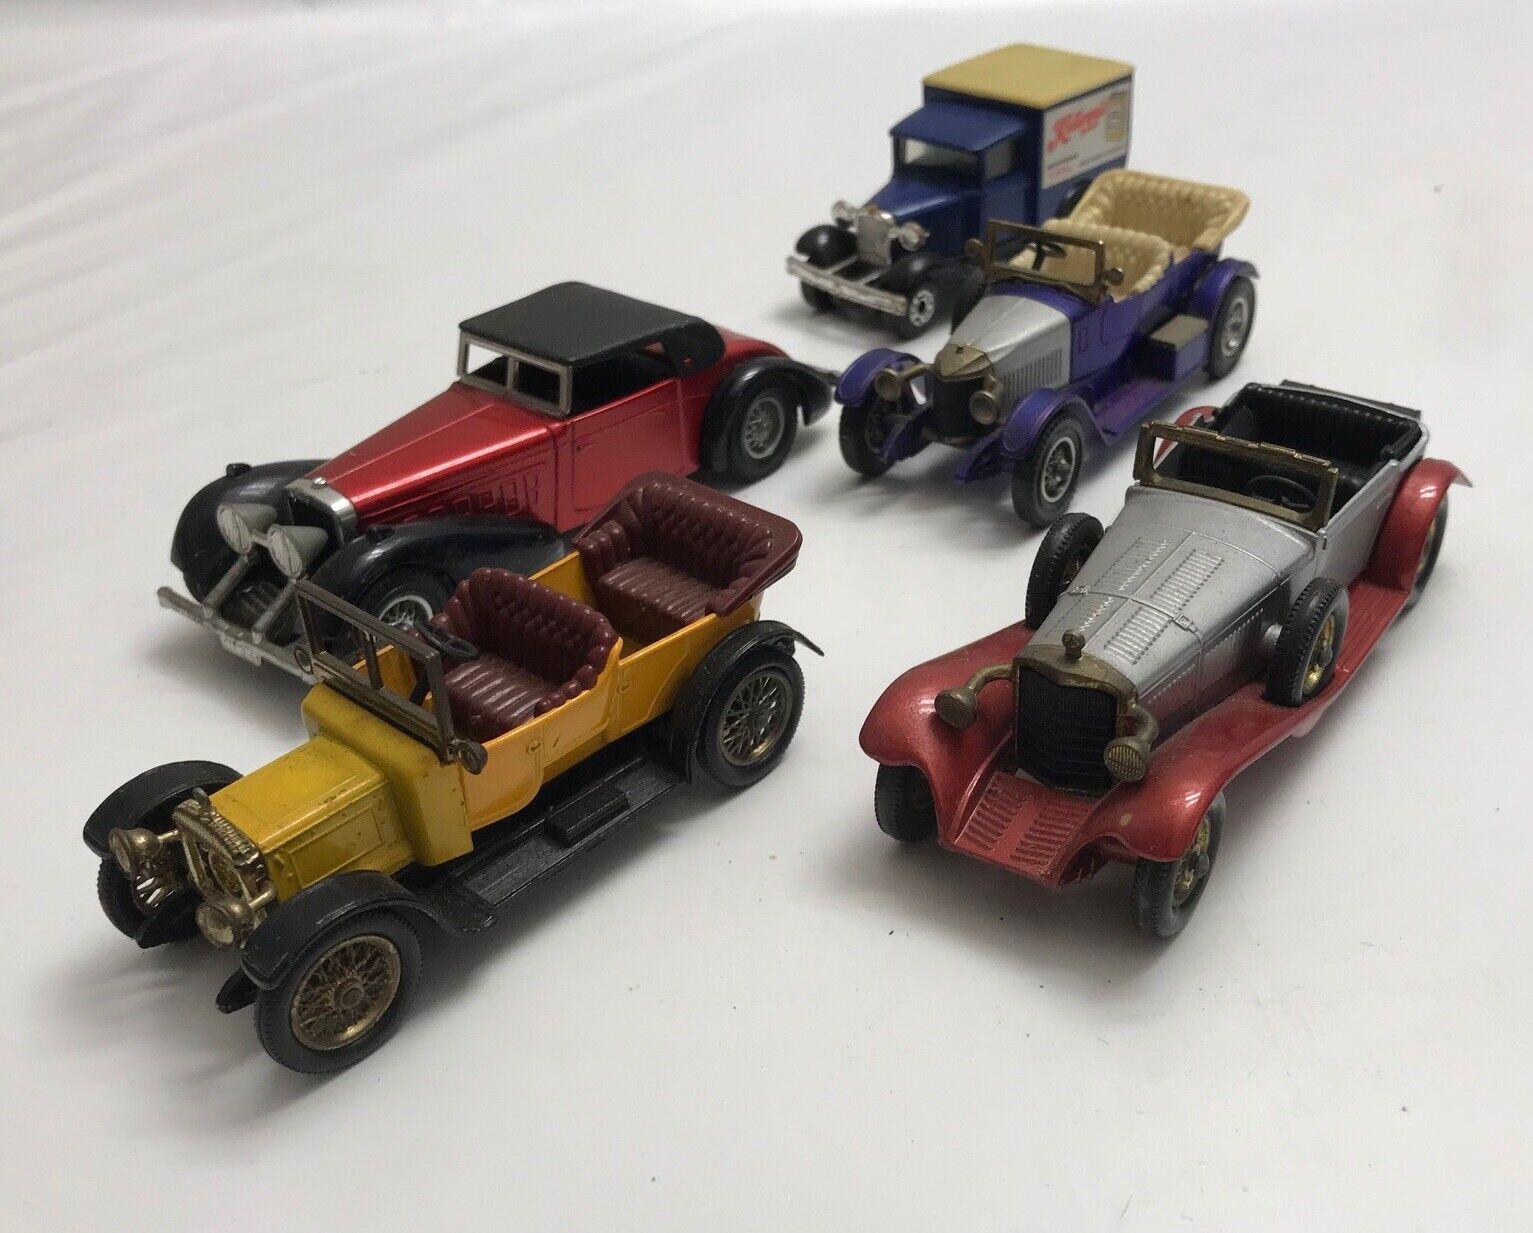 LOT N° 6 d'anciennes petites voitures Matchbox Lesney Etc Models Of Yesteryear